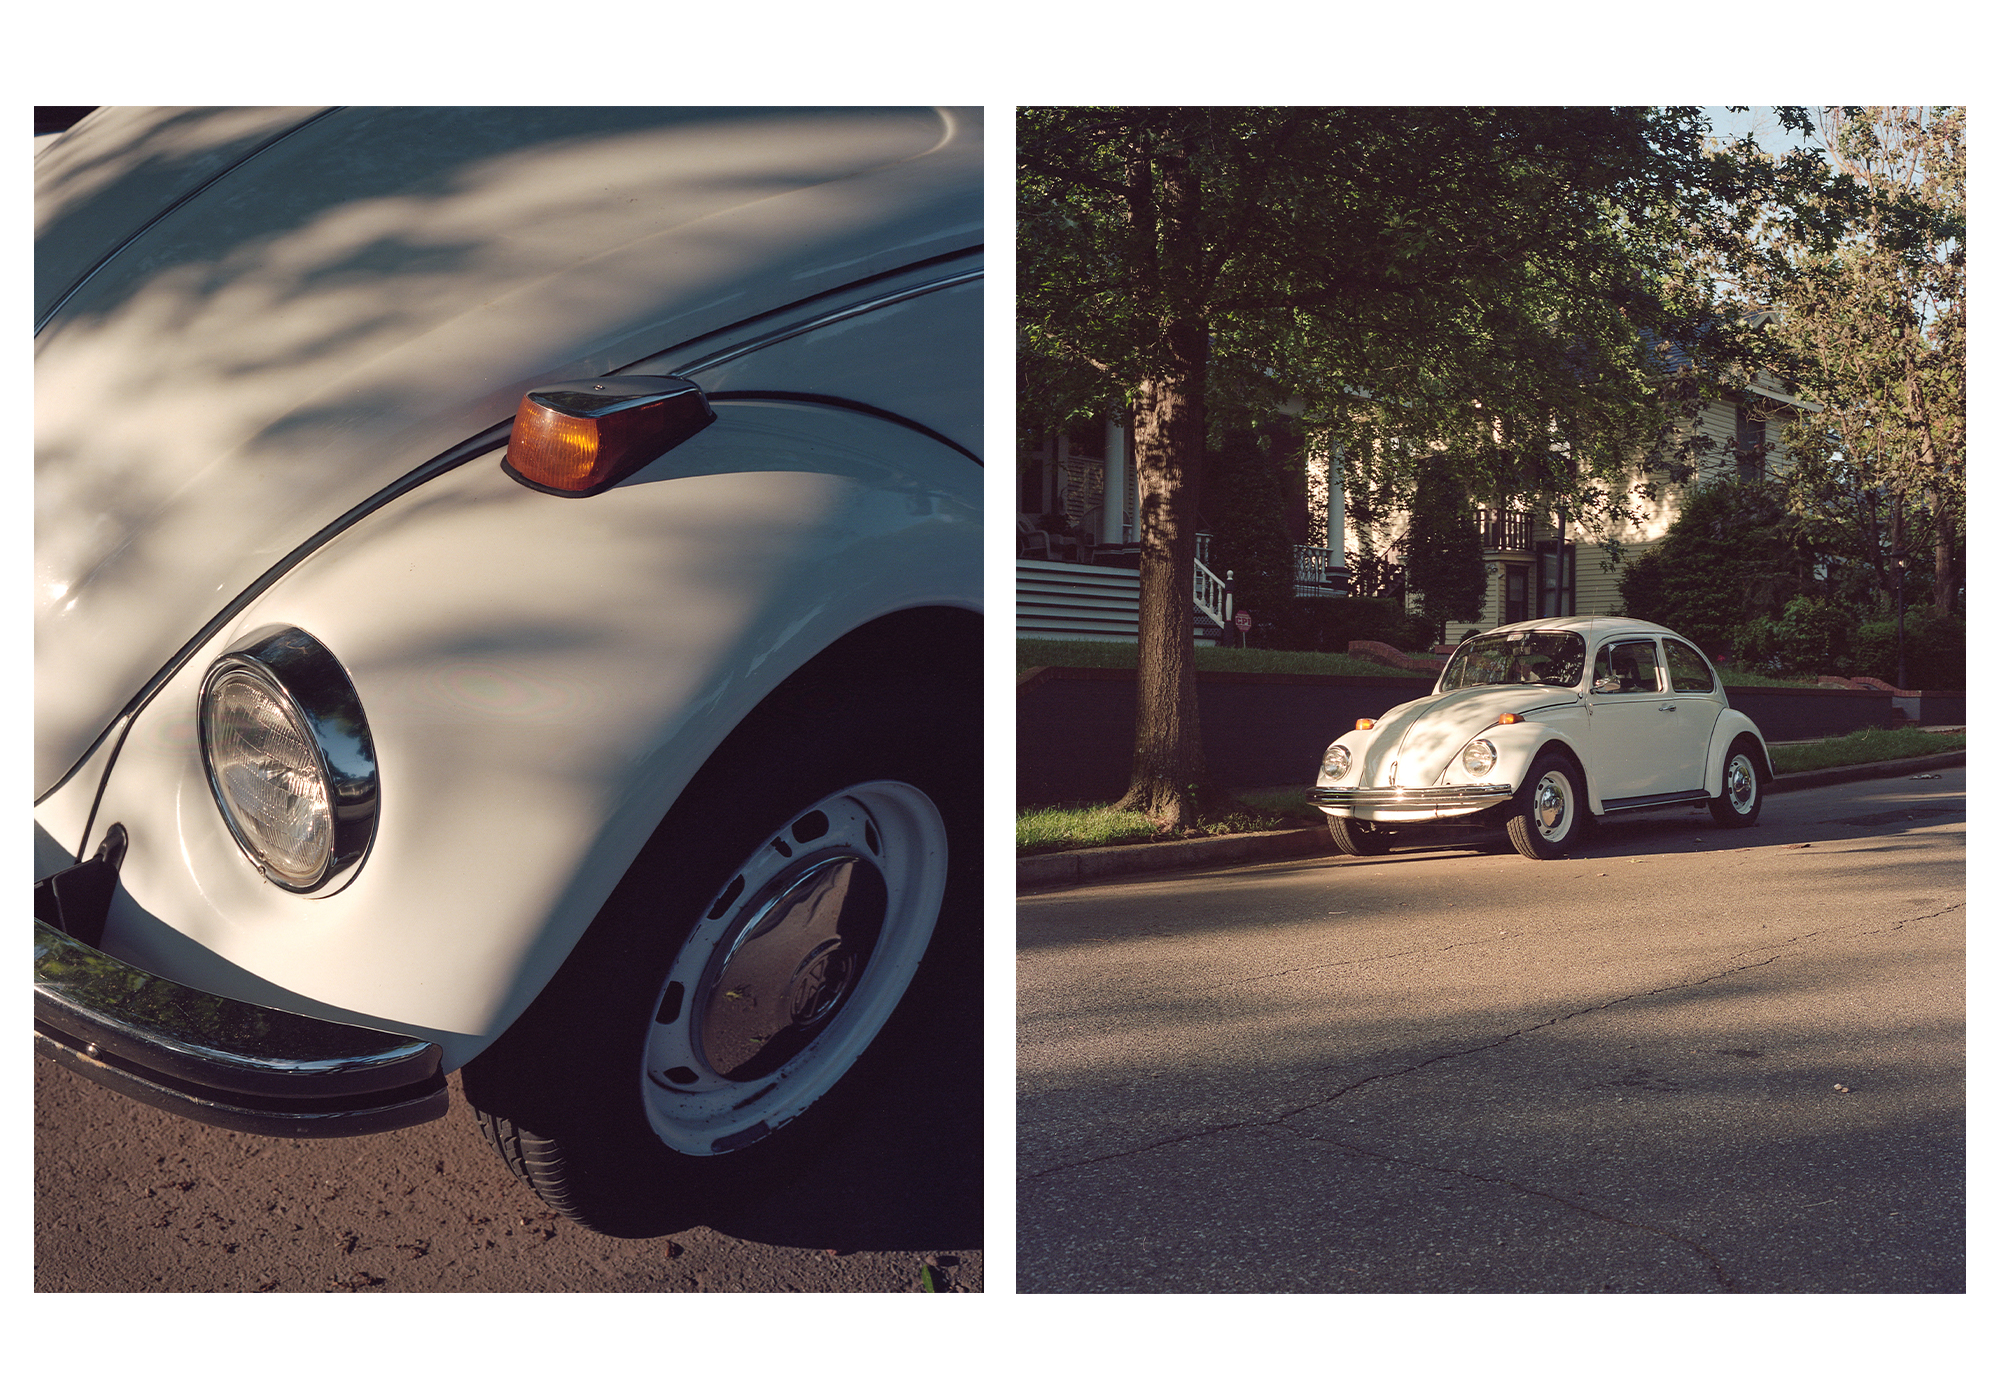 volkswagen-elizabeth_collage.jpg